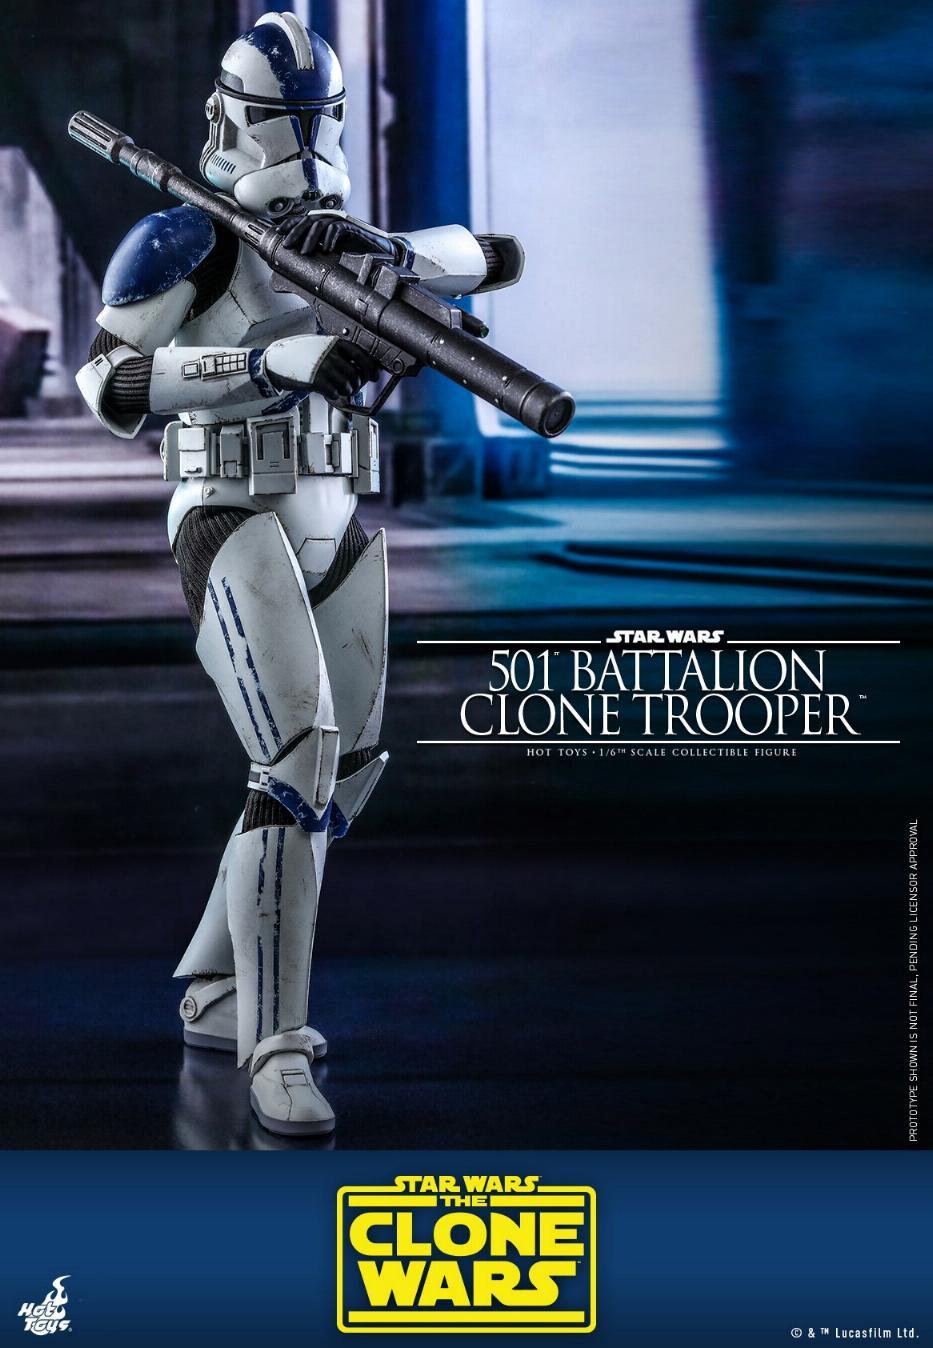 501st Battalion Clone Trooper - The Clone Wars - Hot Toys 0728